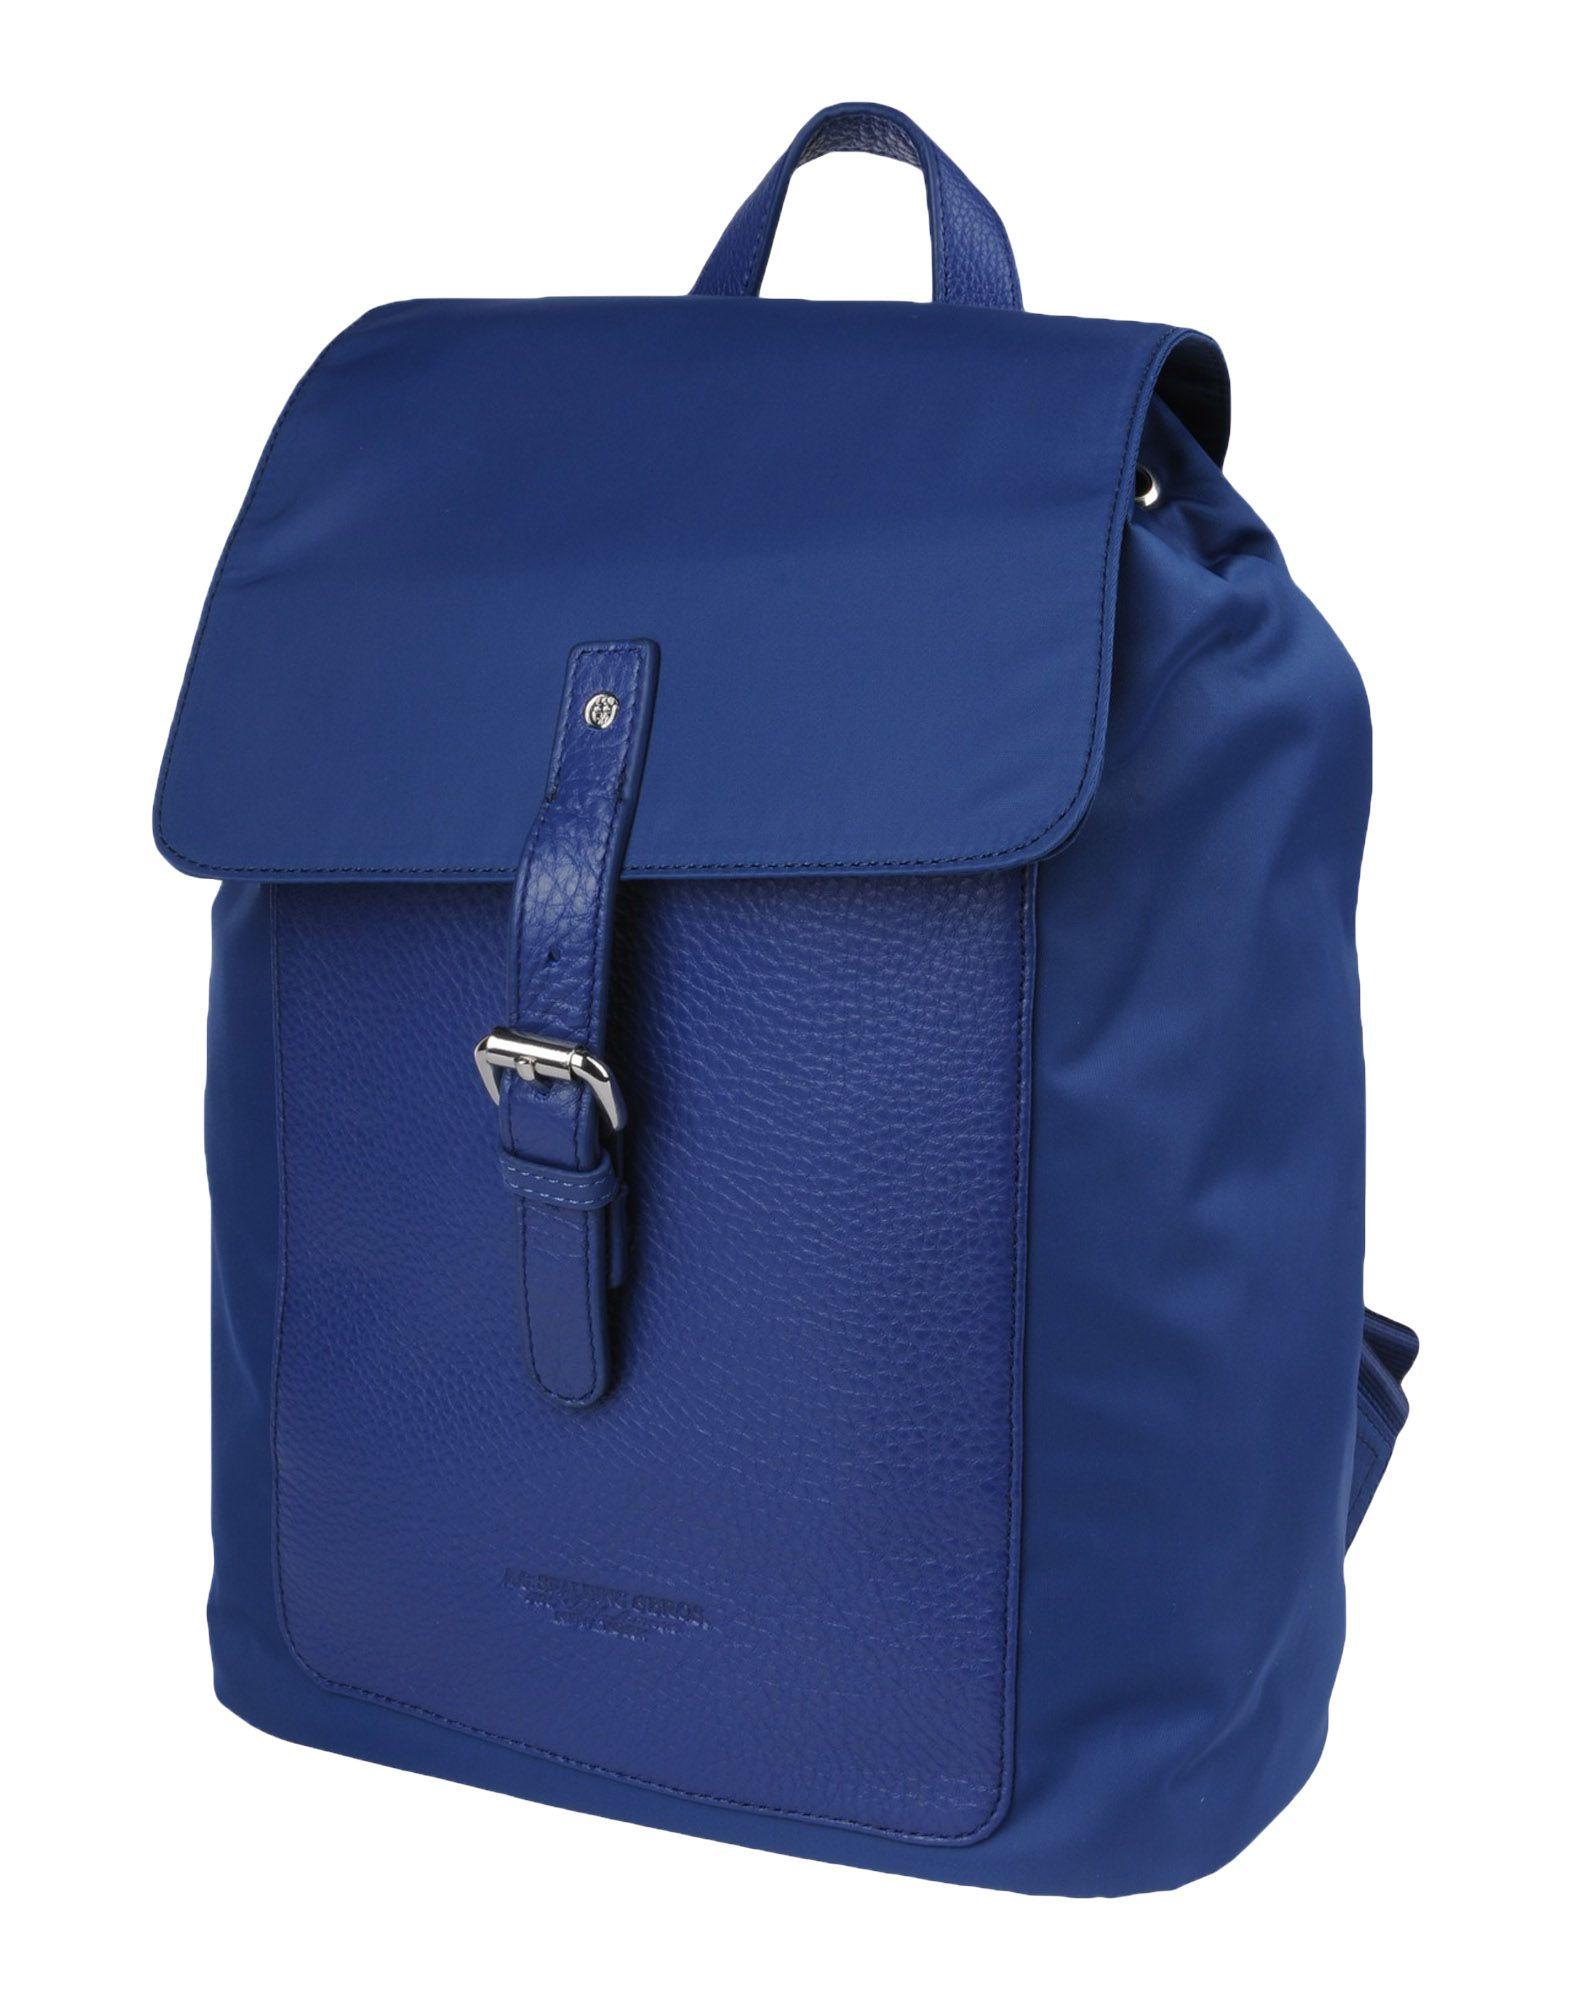 A.G. SPALDING & BROS. 520 FIFTH AVENUE New York Рюкзаки и сумки на пояс декор blau fifth avenue dec tyffanny a 25x75